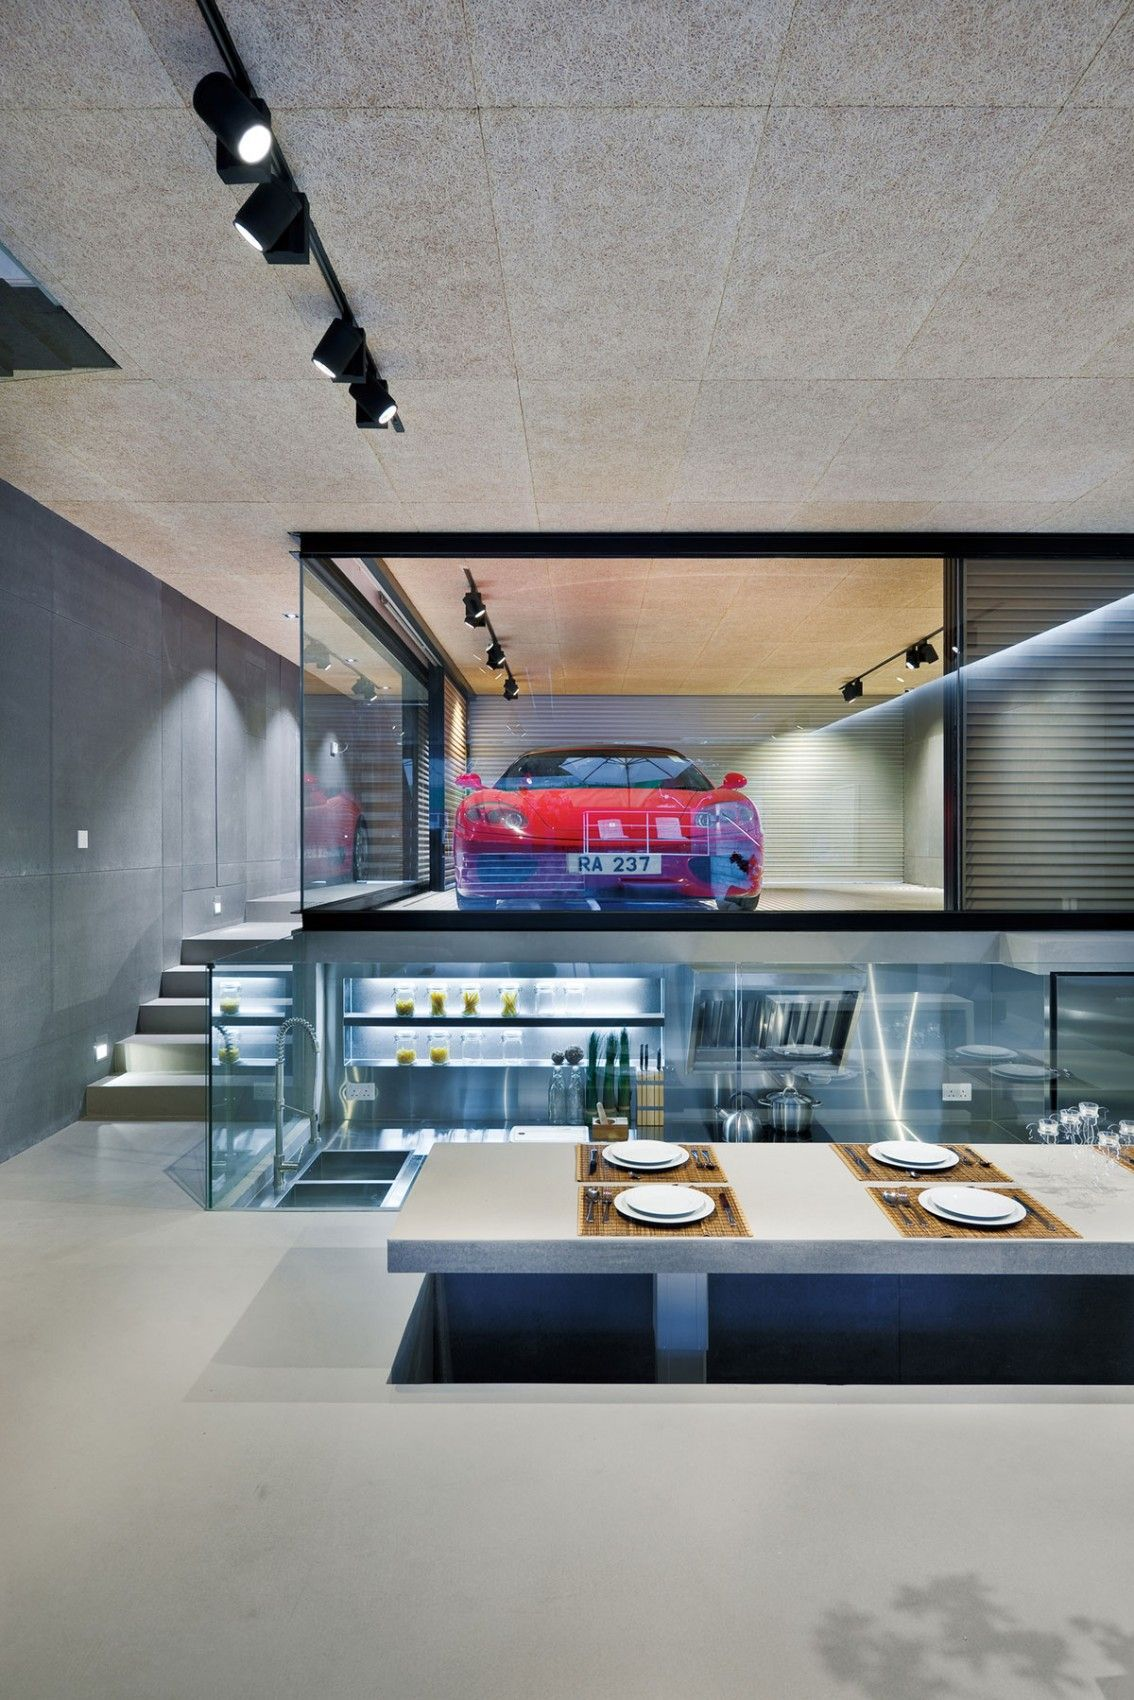 Split Level Hong Kong House Centered Around A Red Ferrari Garage